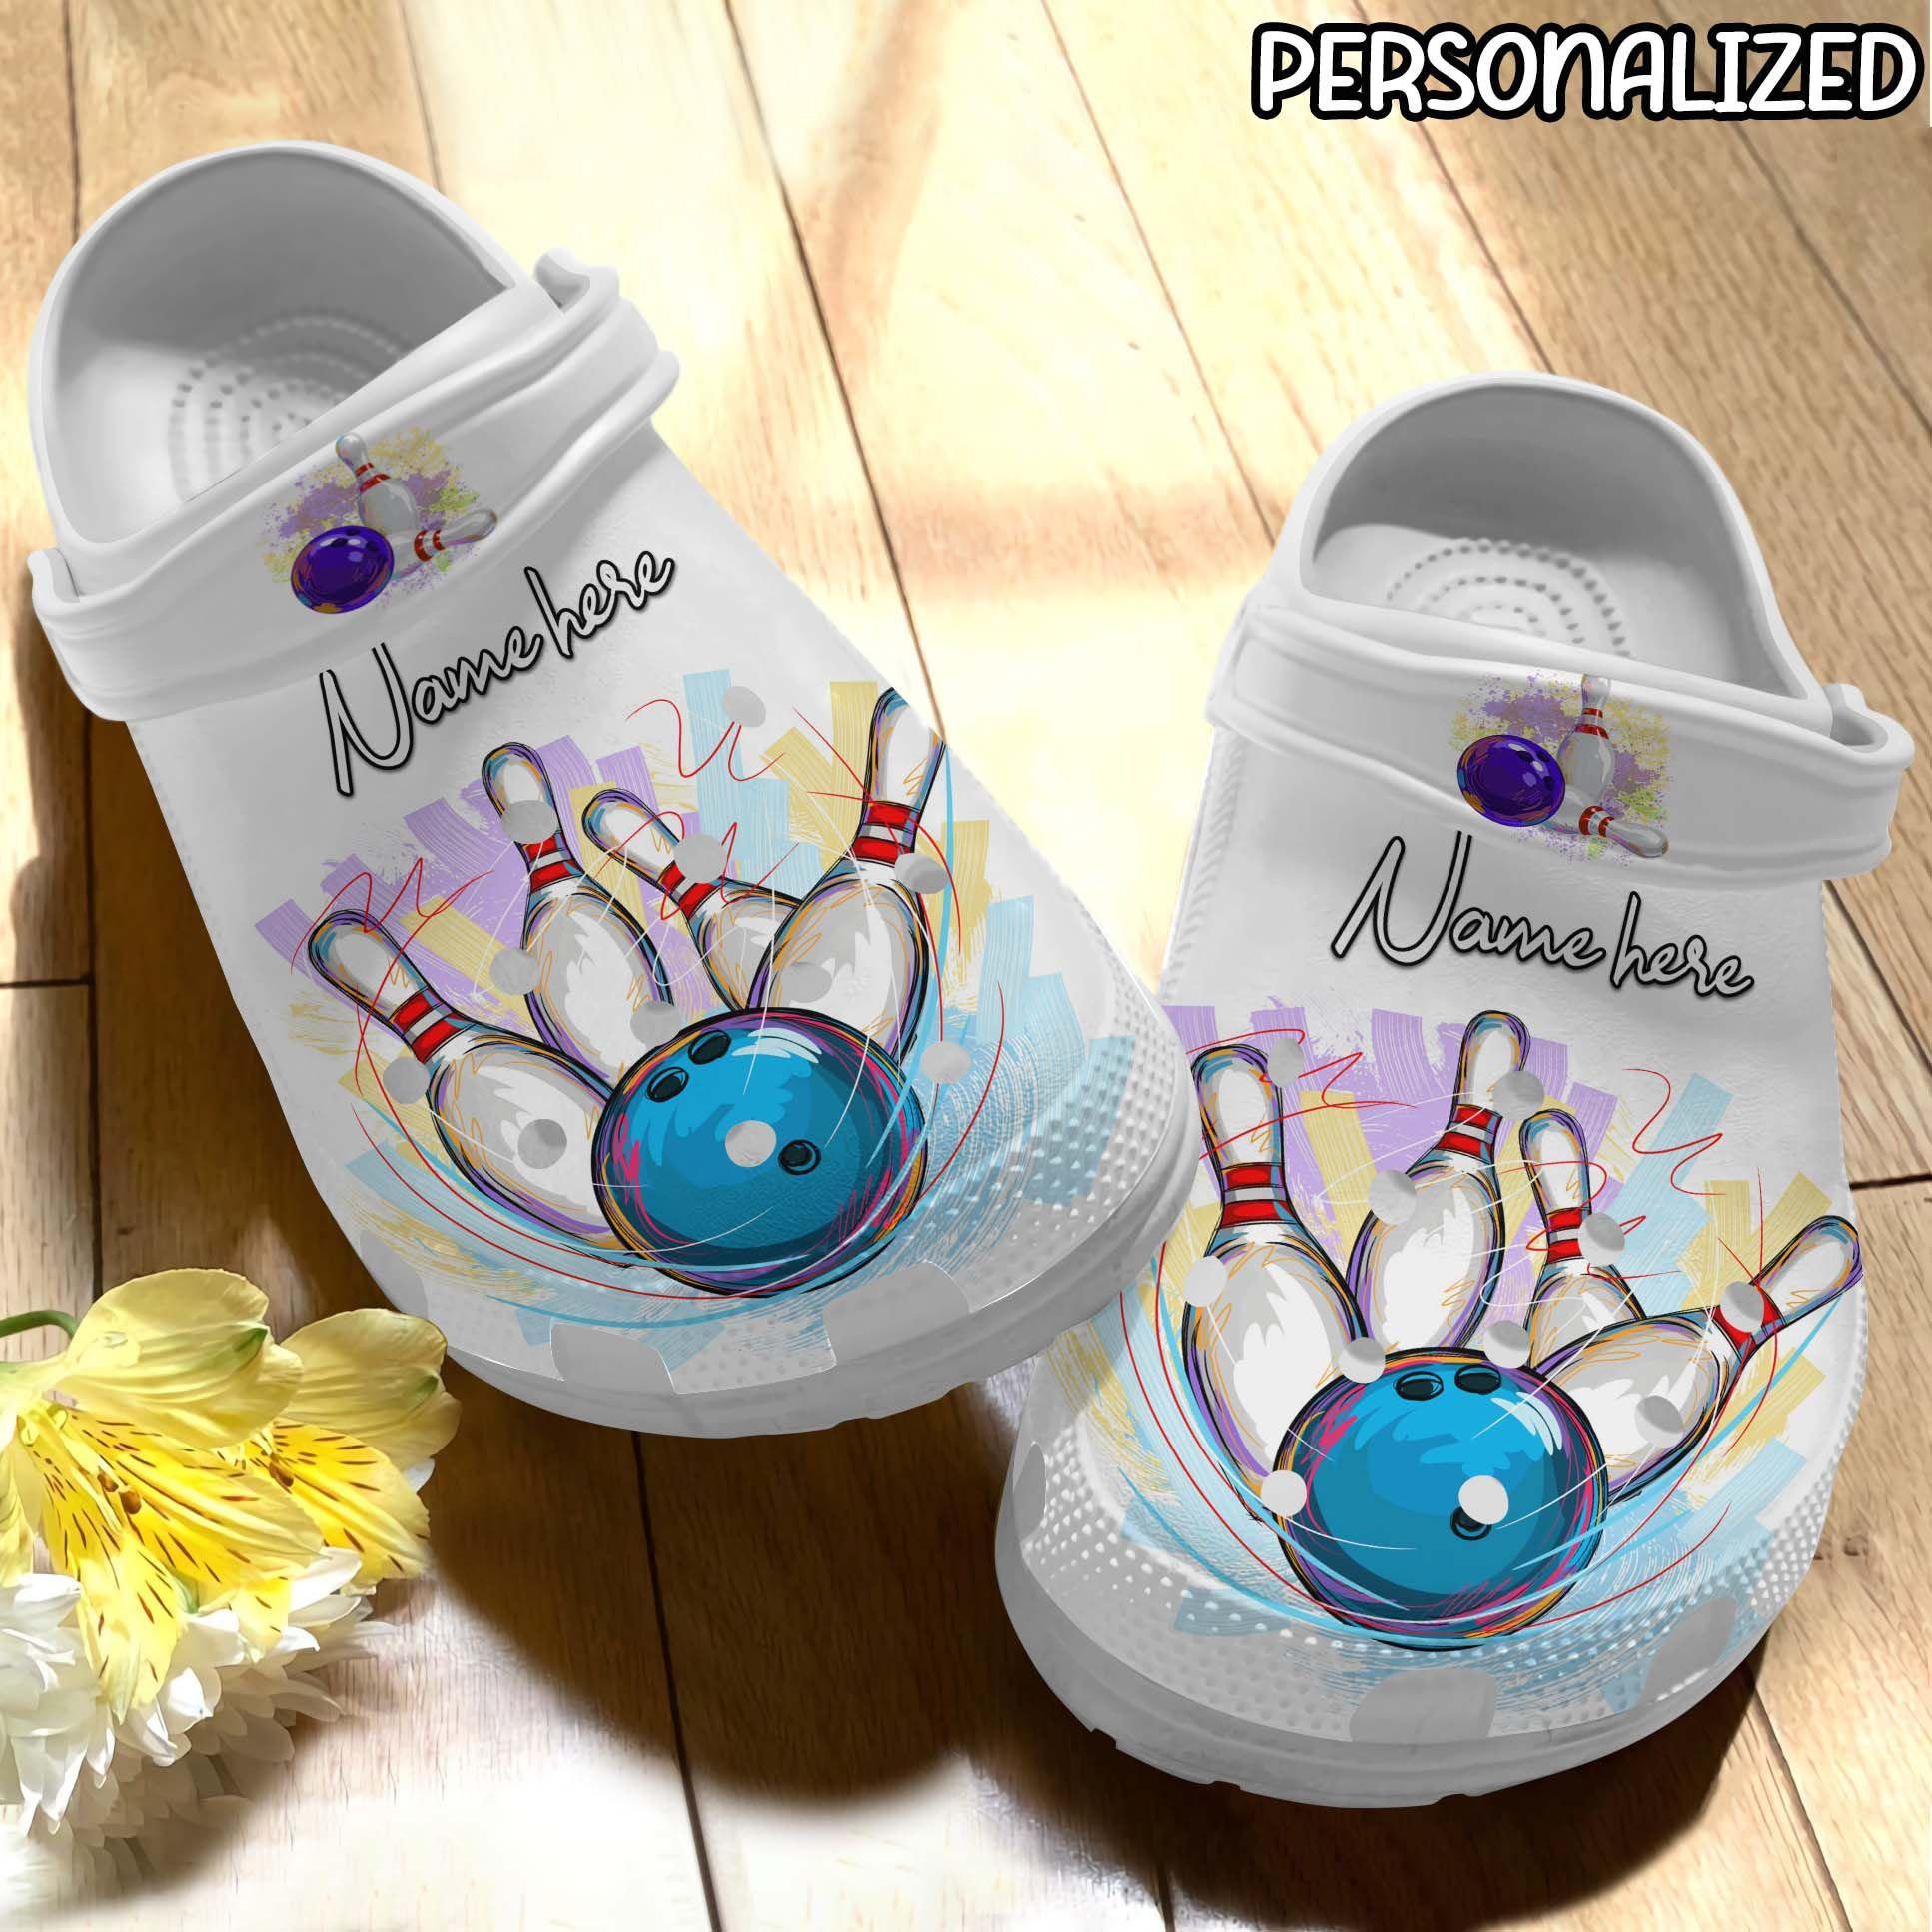 Bowling Personalized Crocs Clog Shoes